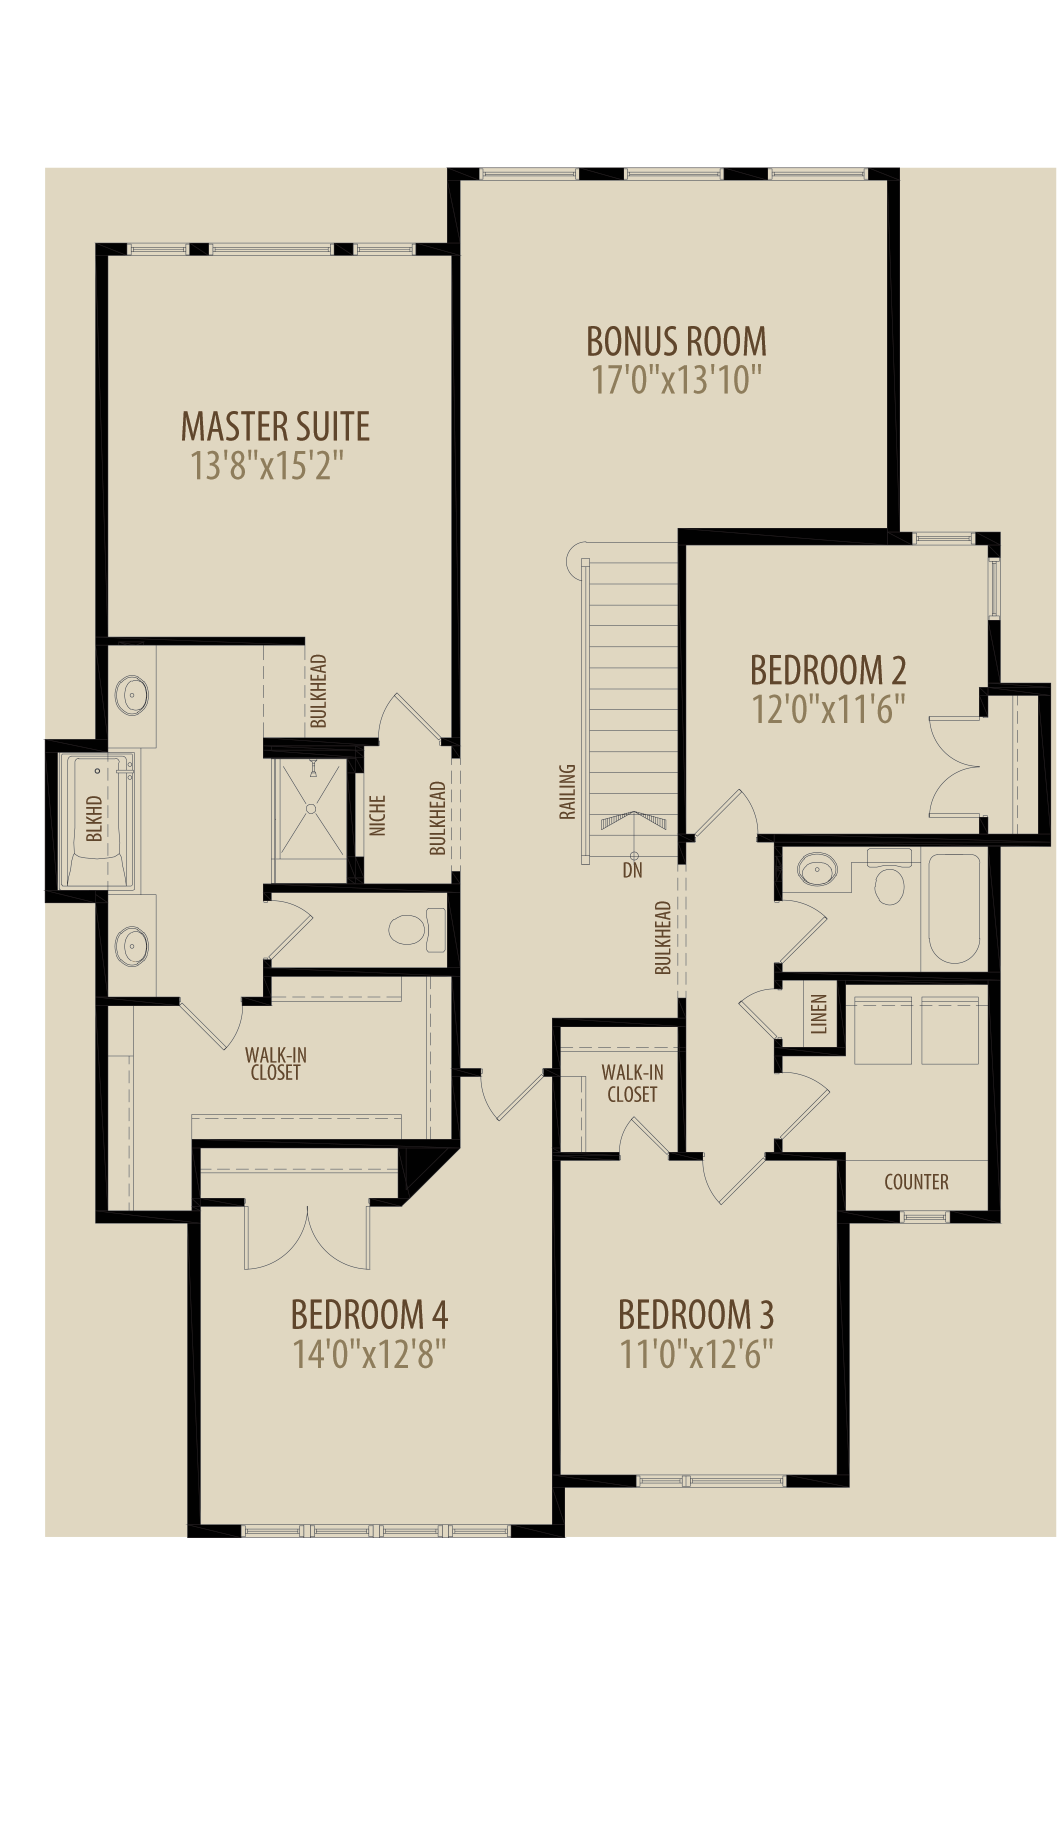 Rear Bonus Room Adds 289 sq ft